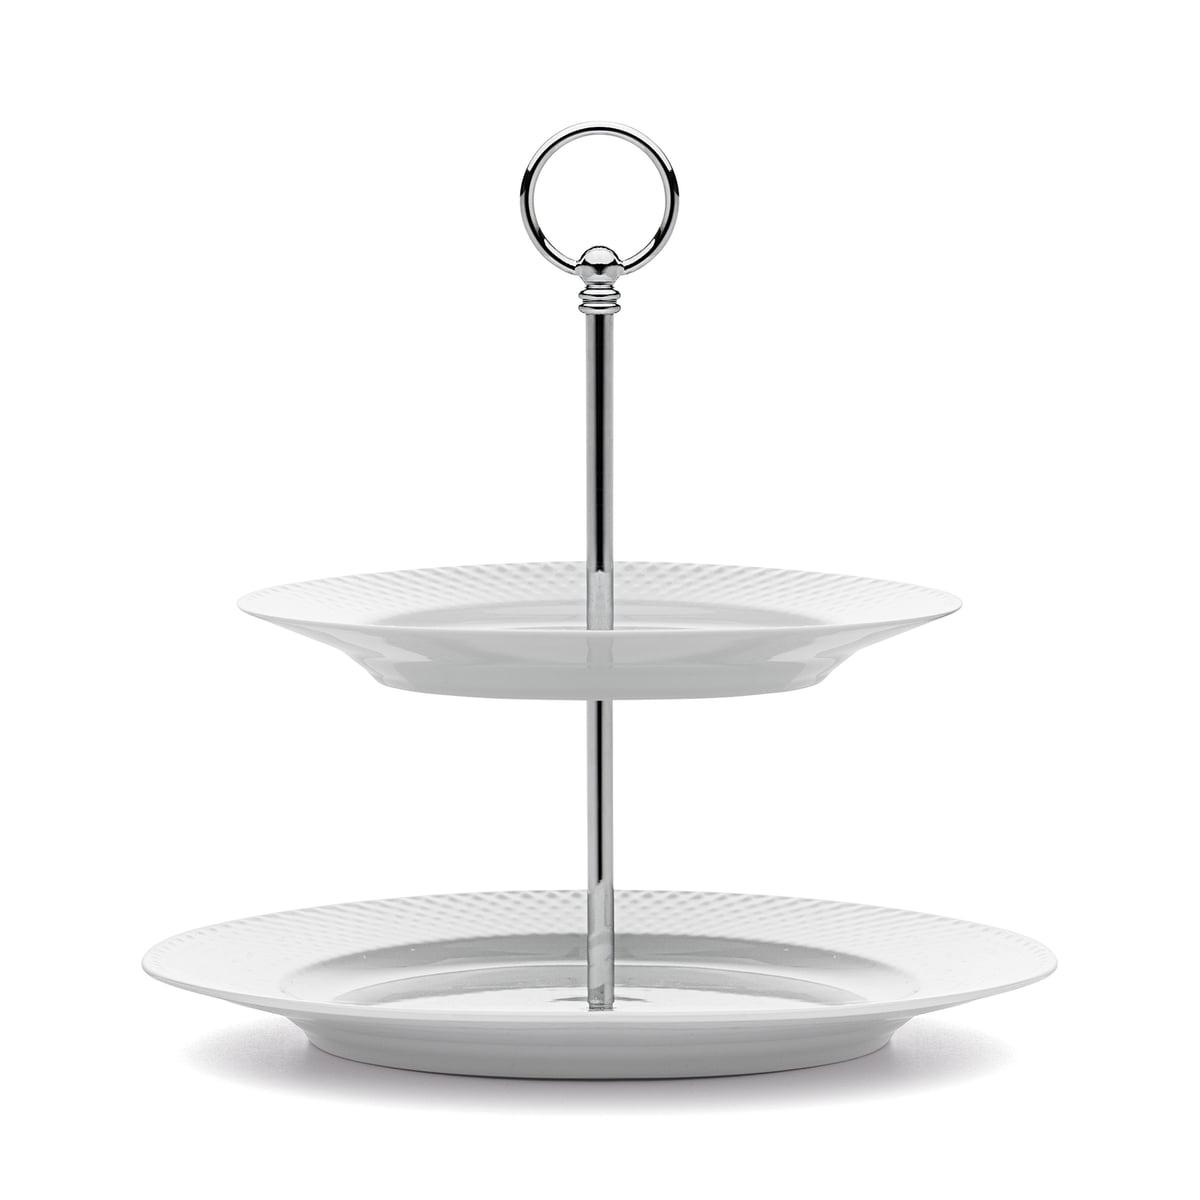 Lyngby Porcelæn - Rhombe Etagere Ø 27 cm, weiß